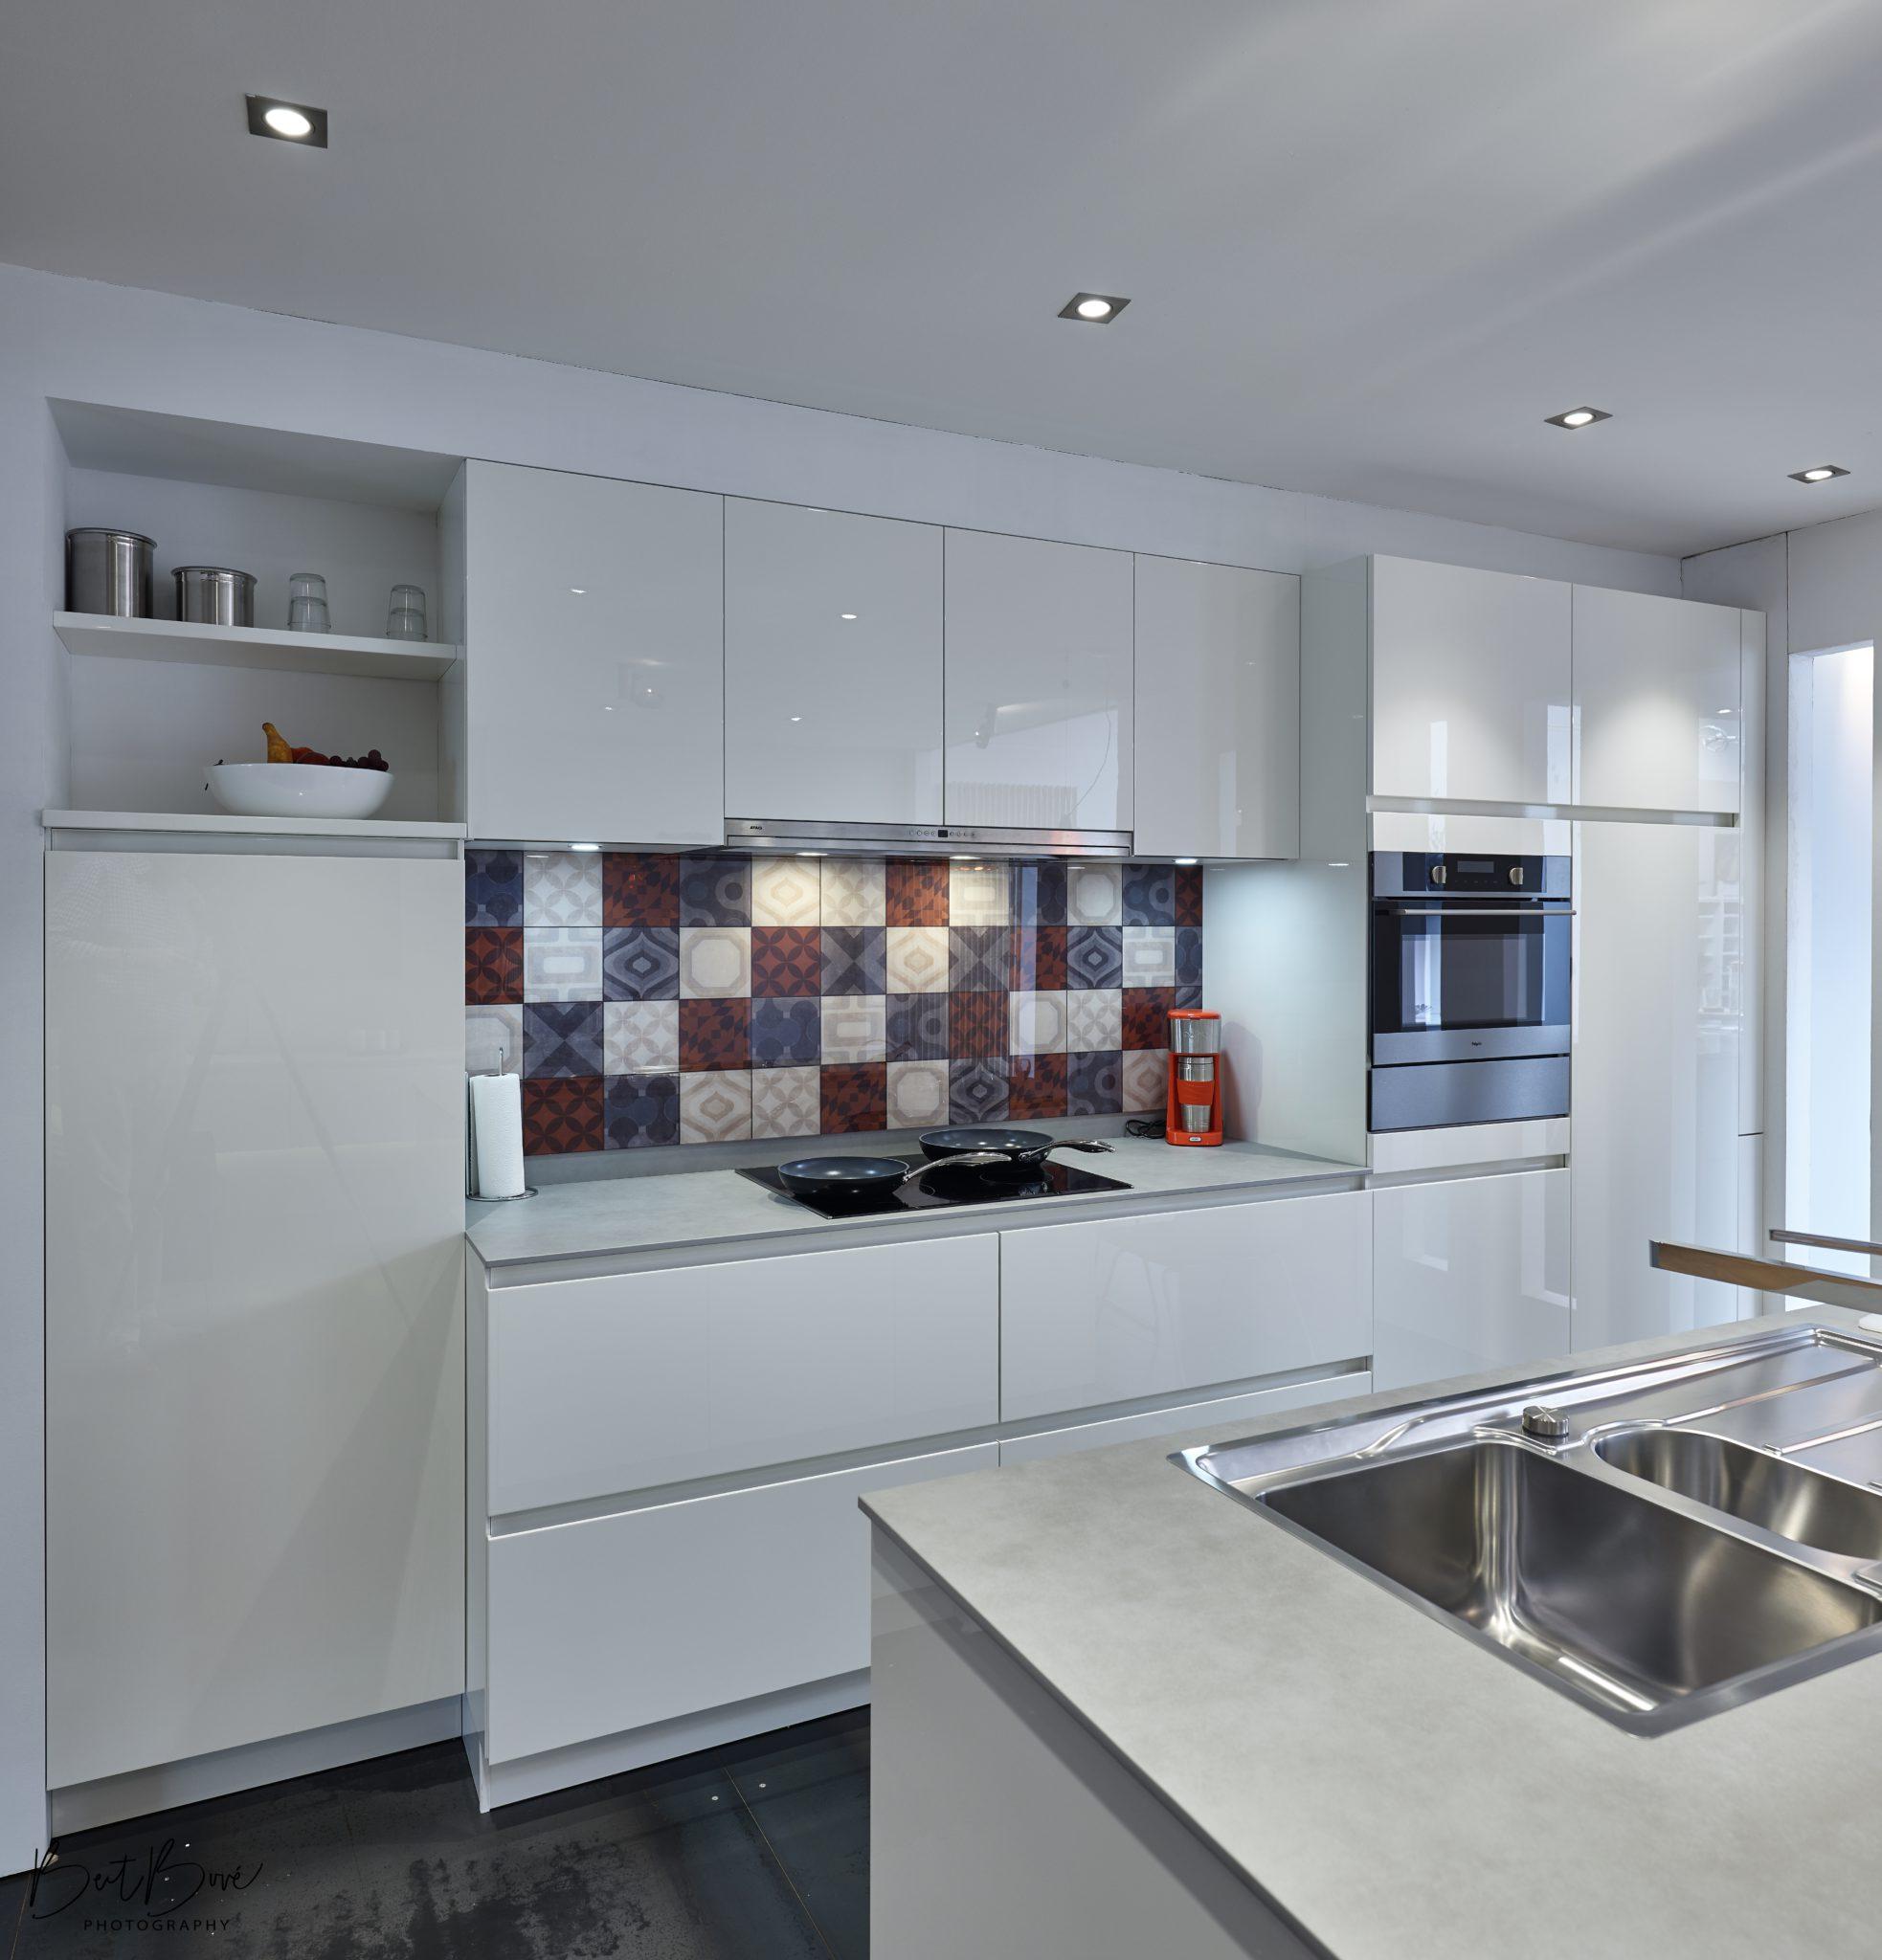 toonzaal keukens 2018 12 1 buv keukens